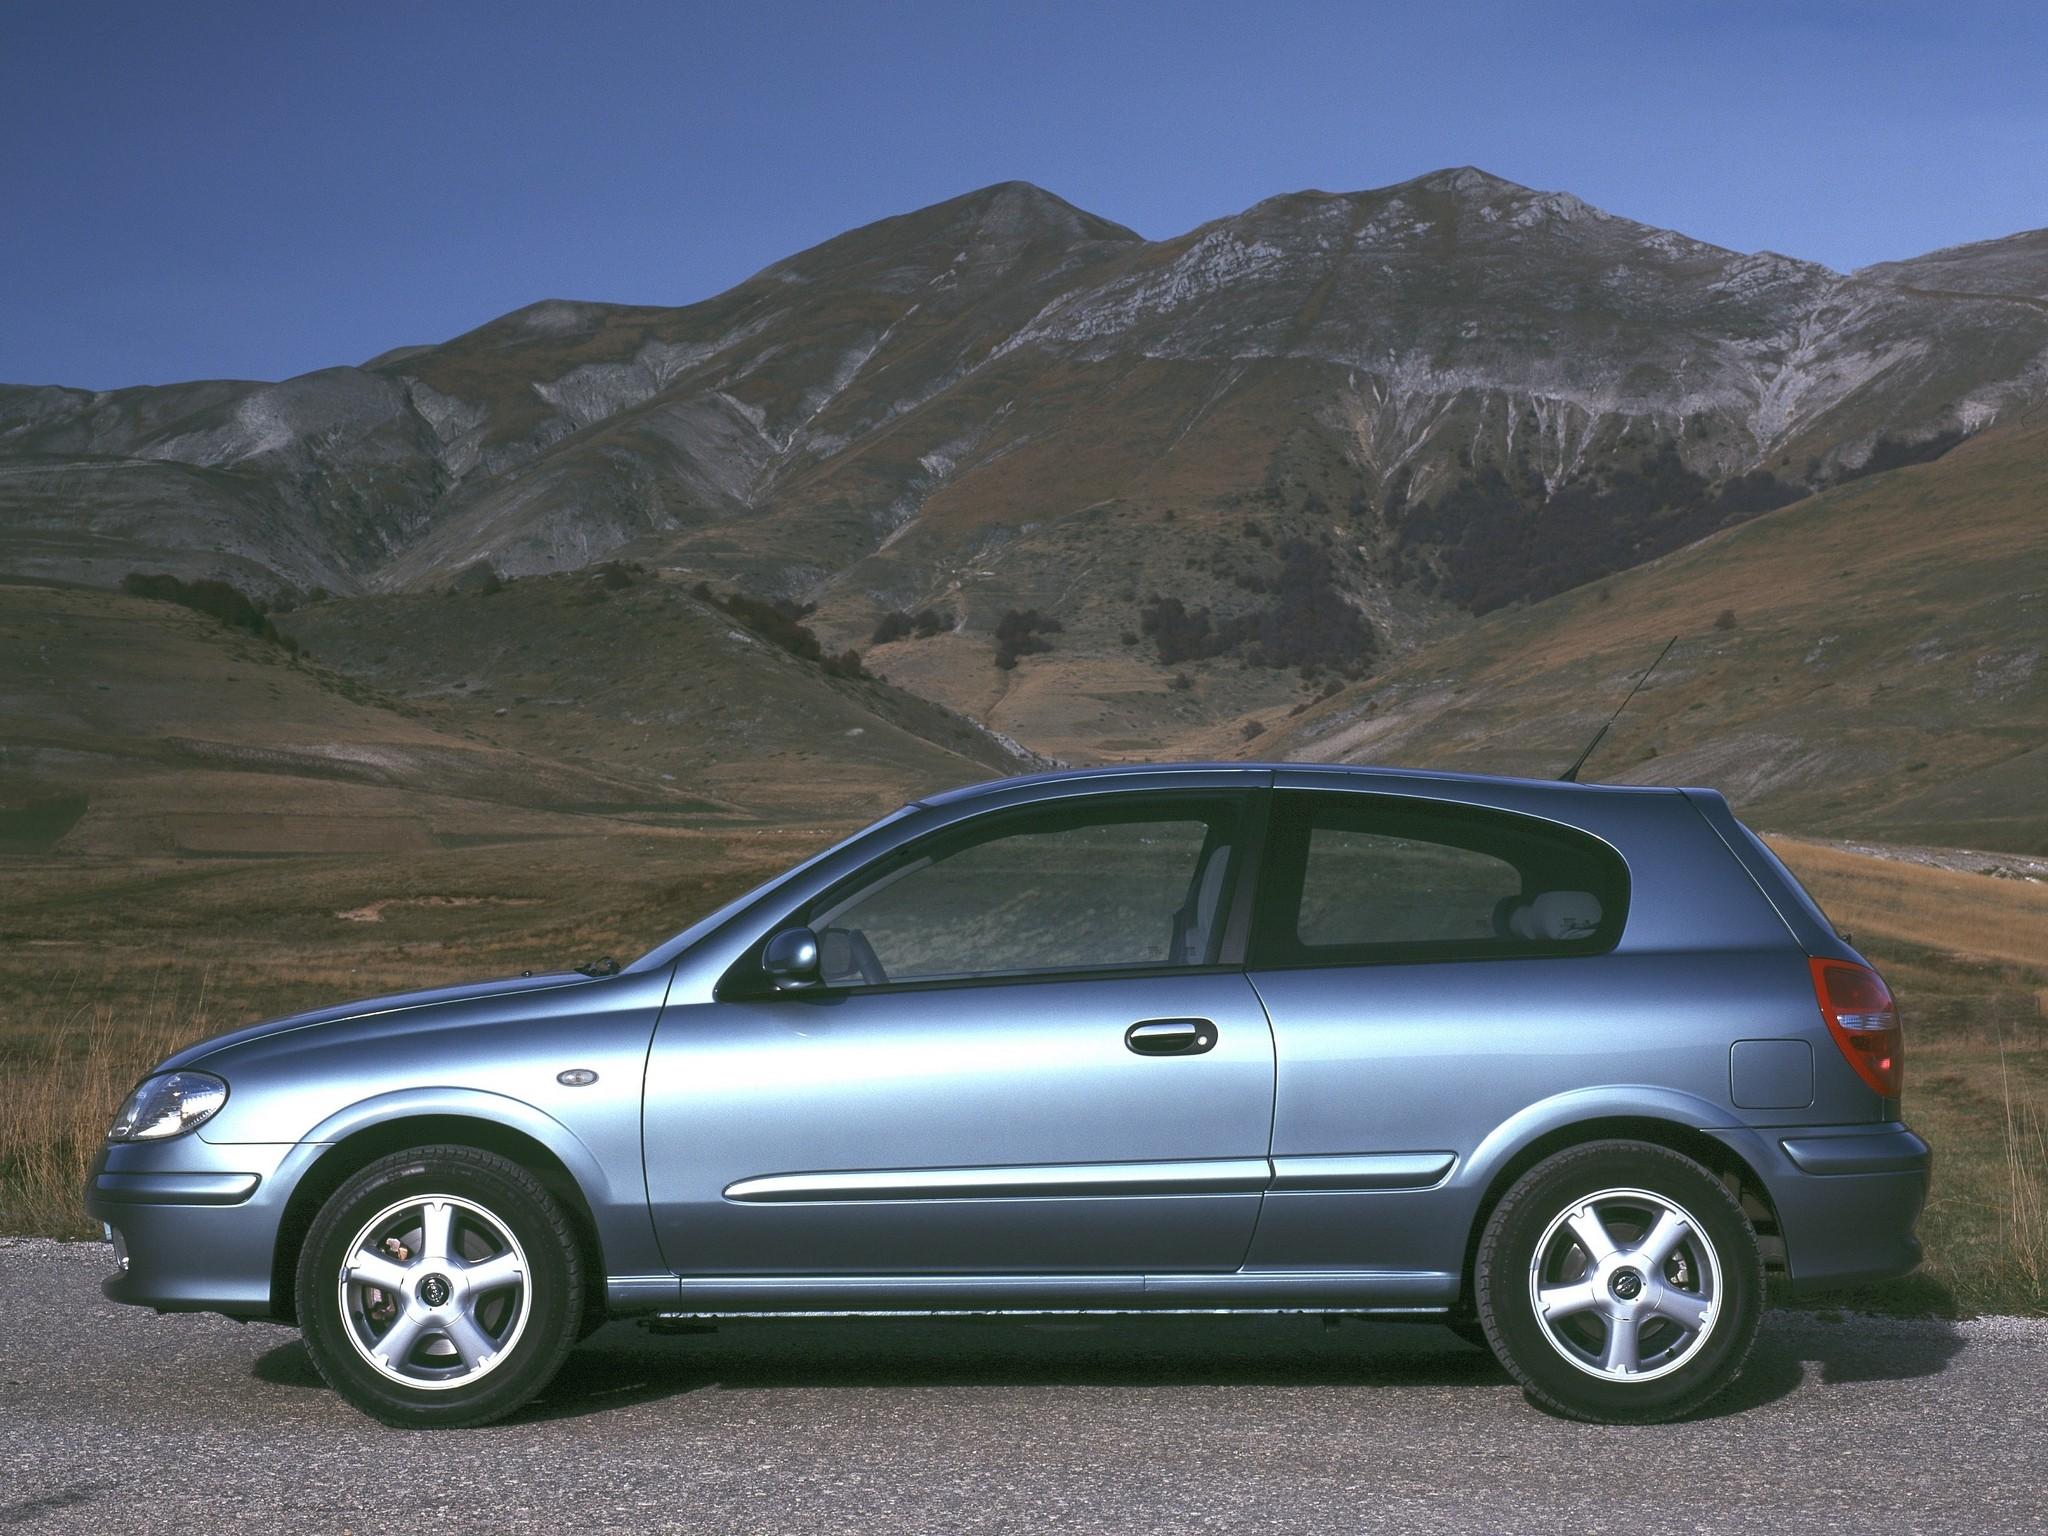 Gt Auto Sales >> NISSAN Almera / Pulsar 3 Doors specs & photos - 2000, 2001 ...